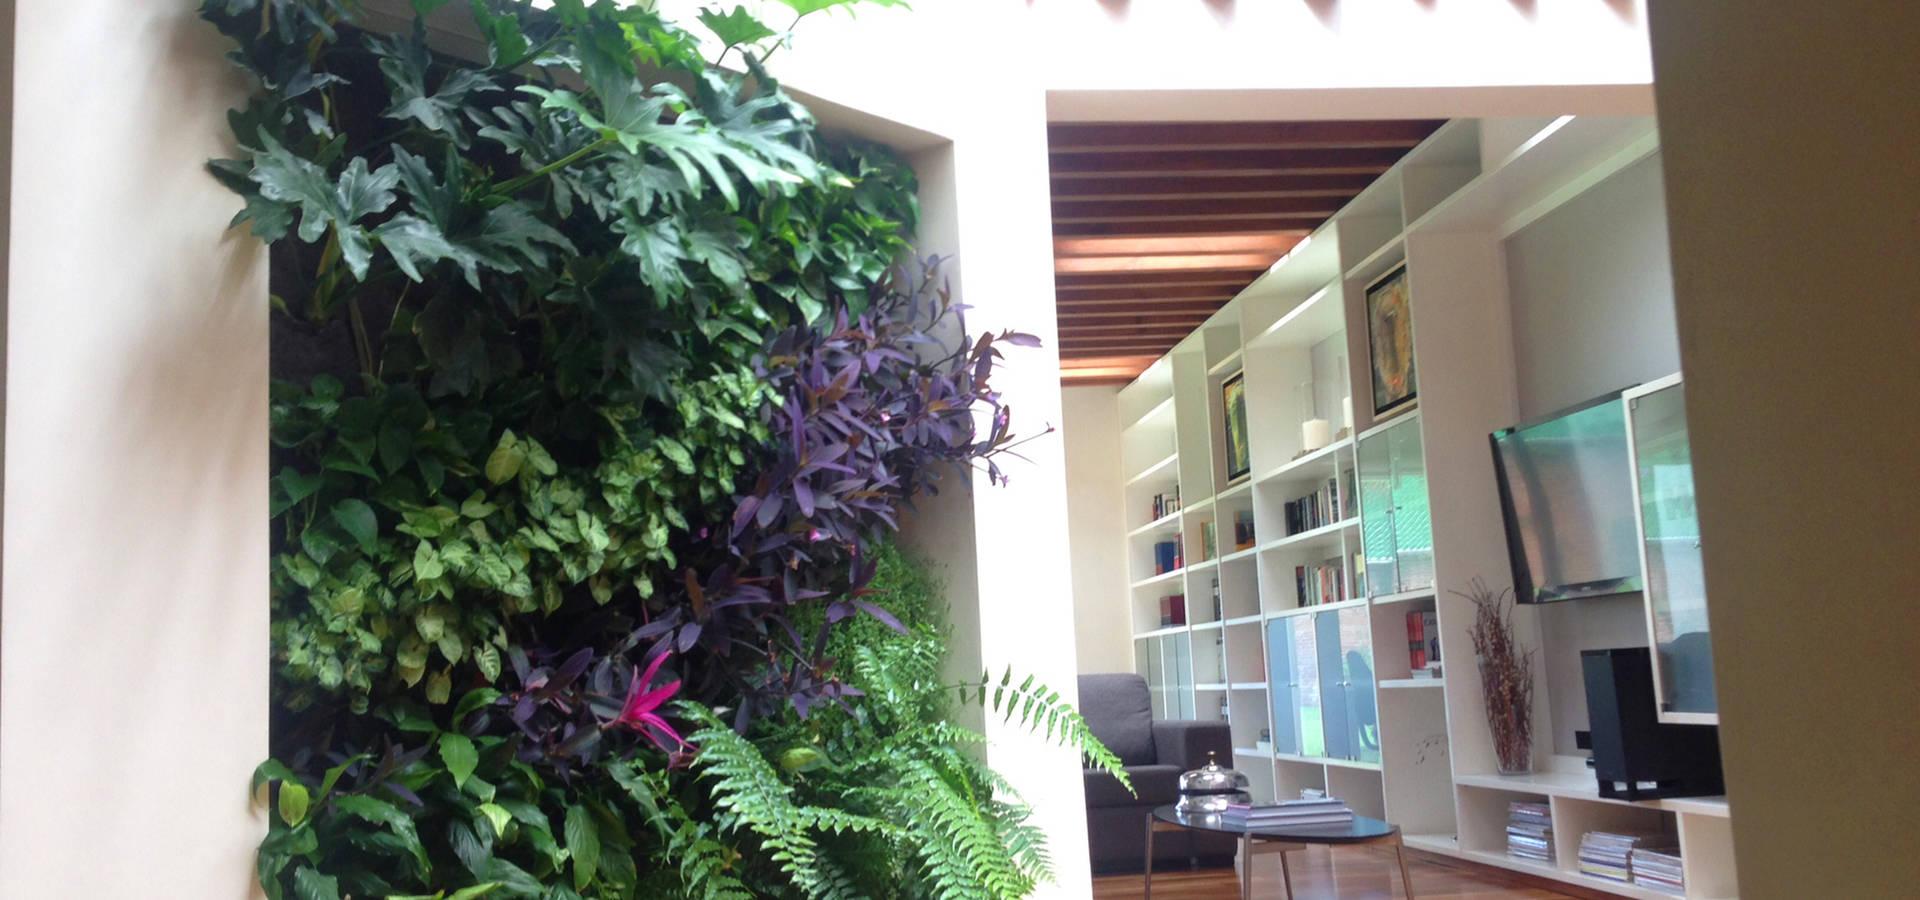 Muros verdes jardines verticales de enverde homify for Muros verdes verticales